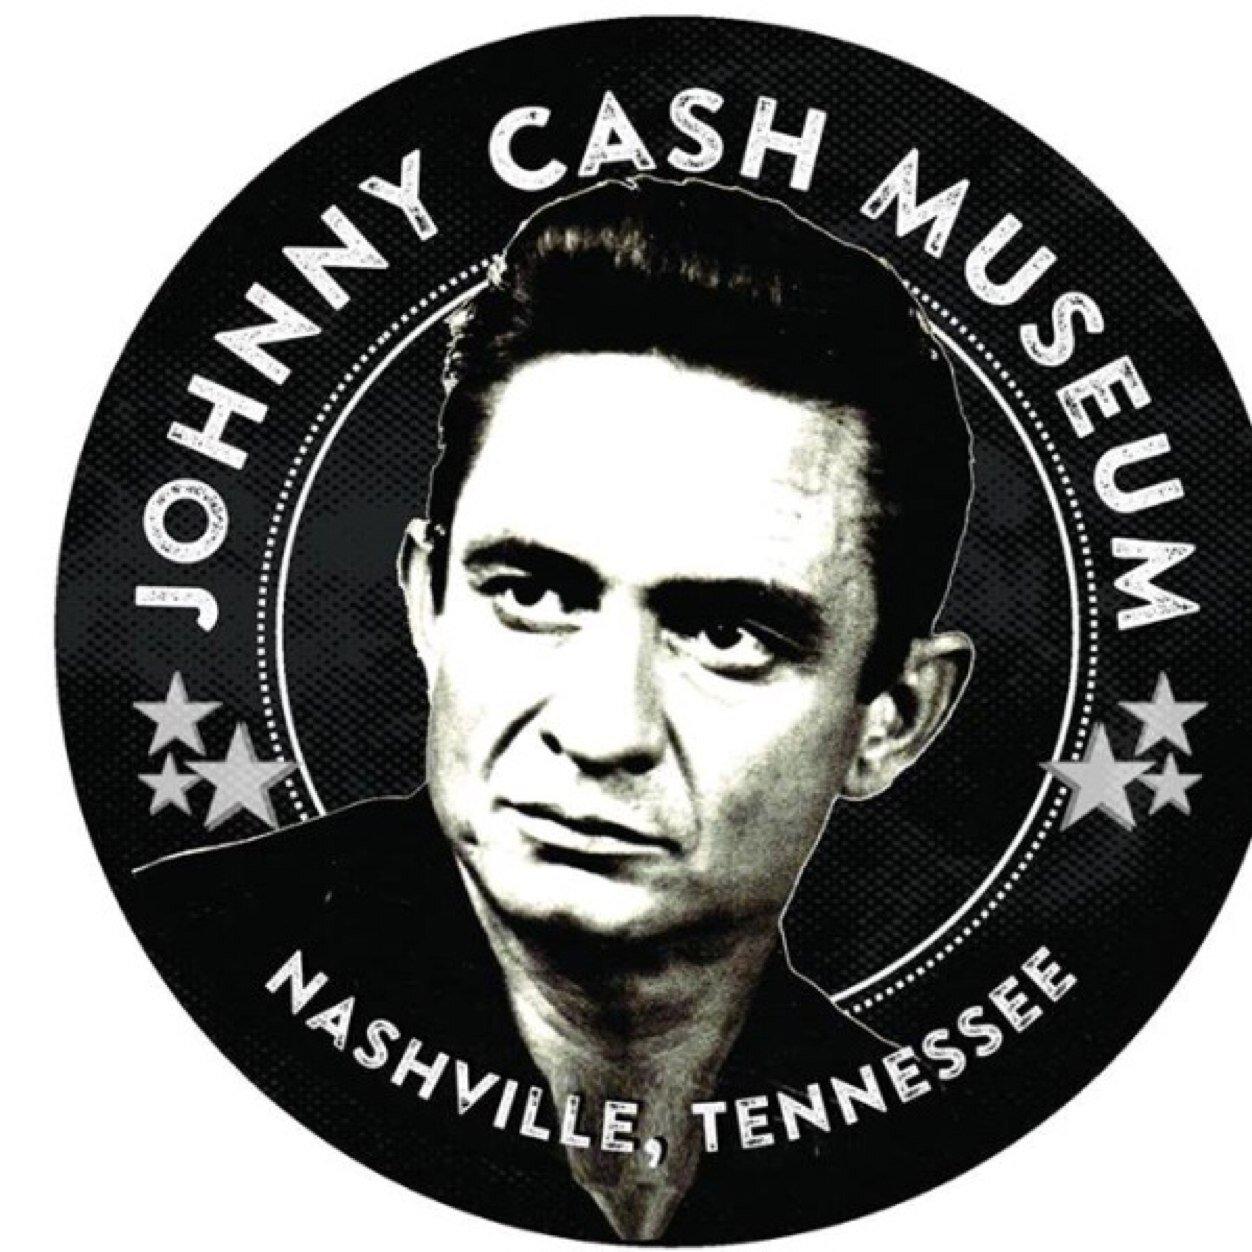 CashMuseum